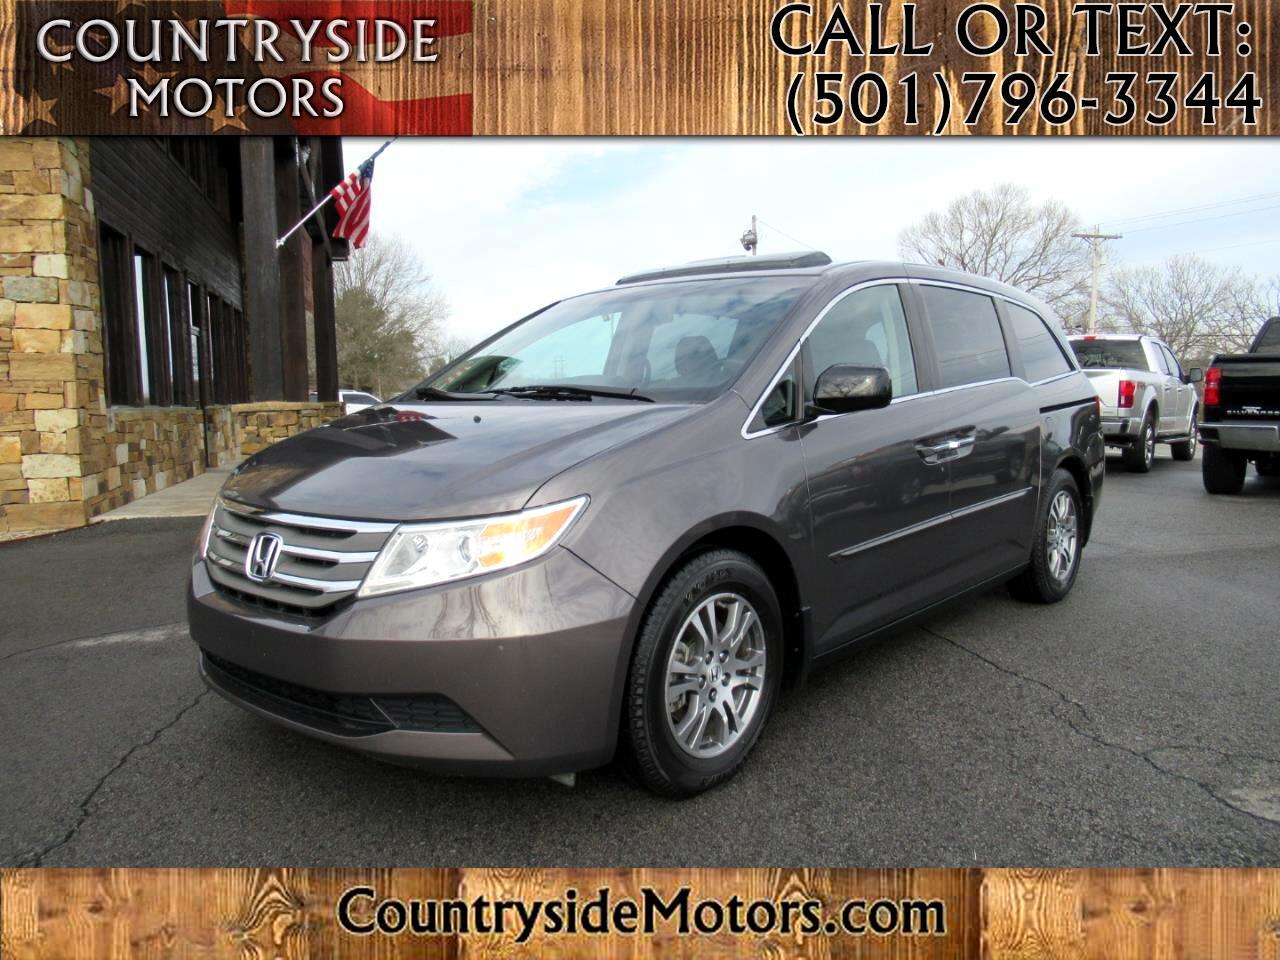 2013 Honda Odyssey EX-L w/ Navigation